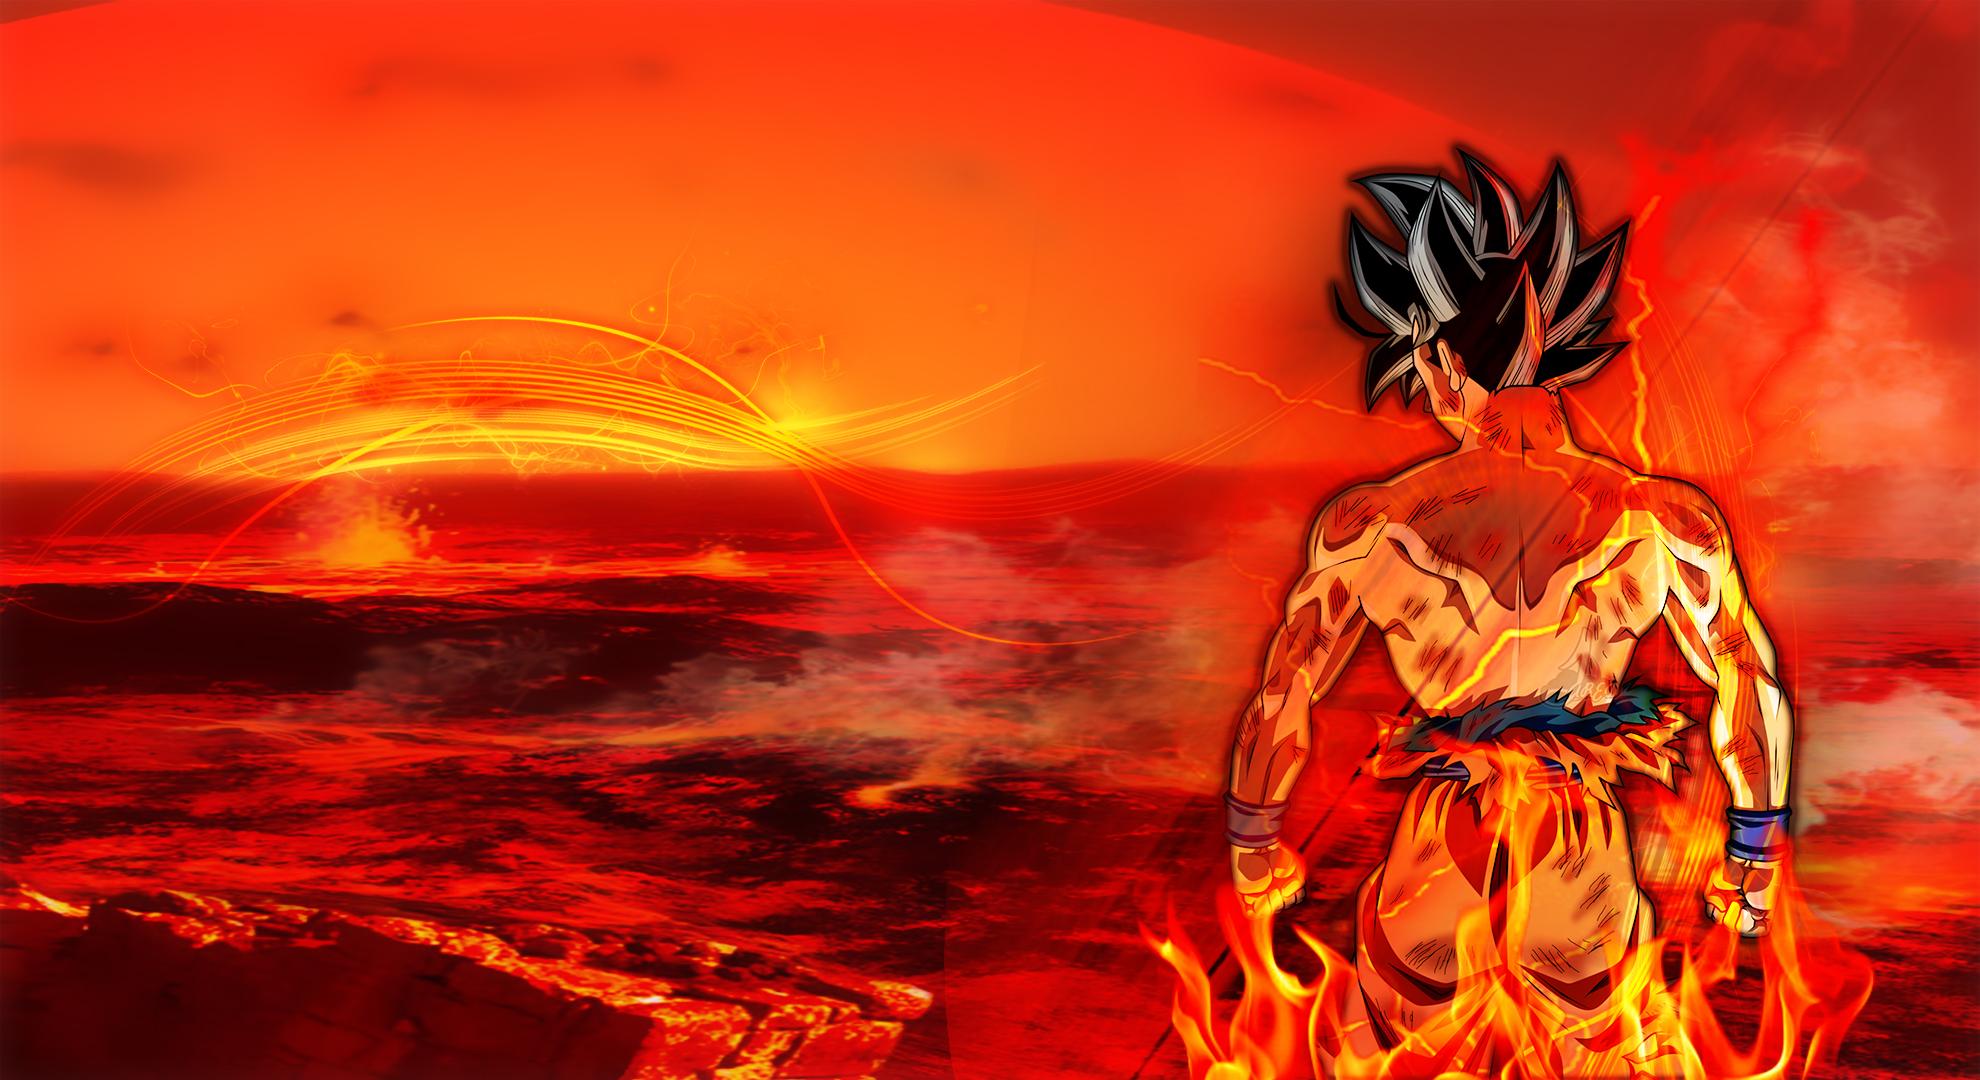 Goku On Fire HD Wallpaper   Background Image   1980x1080 ...